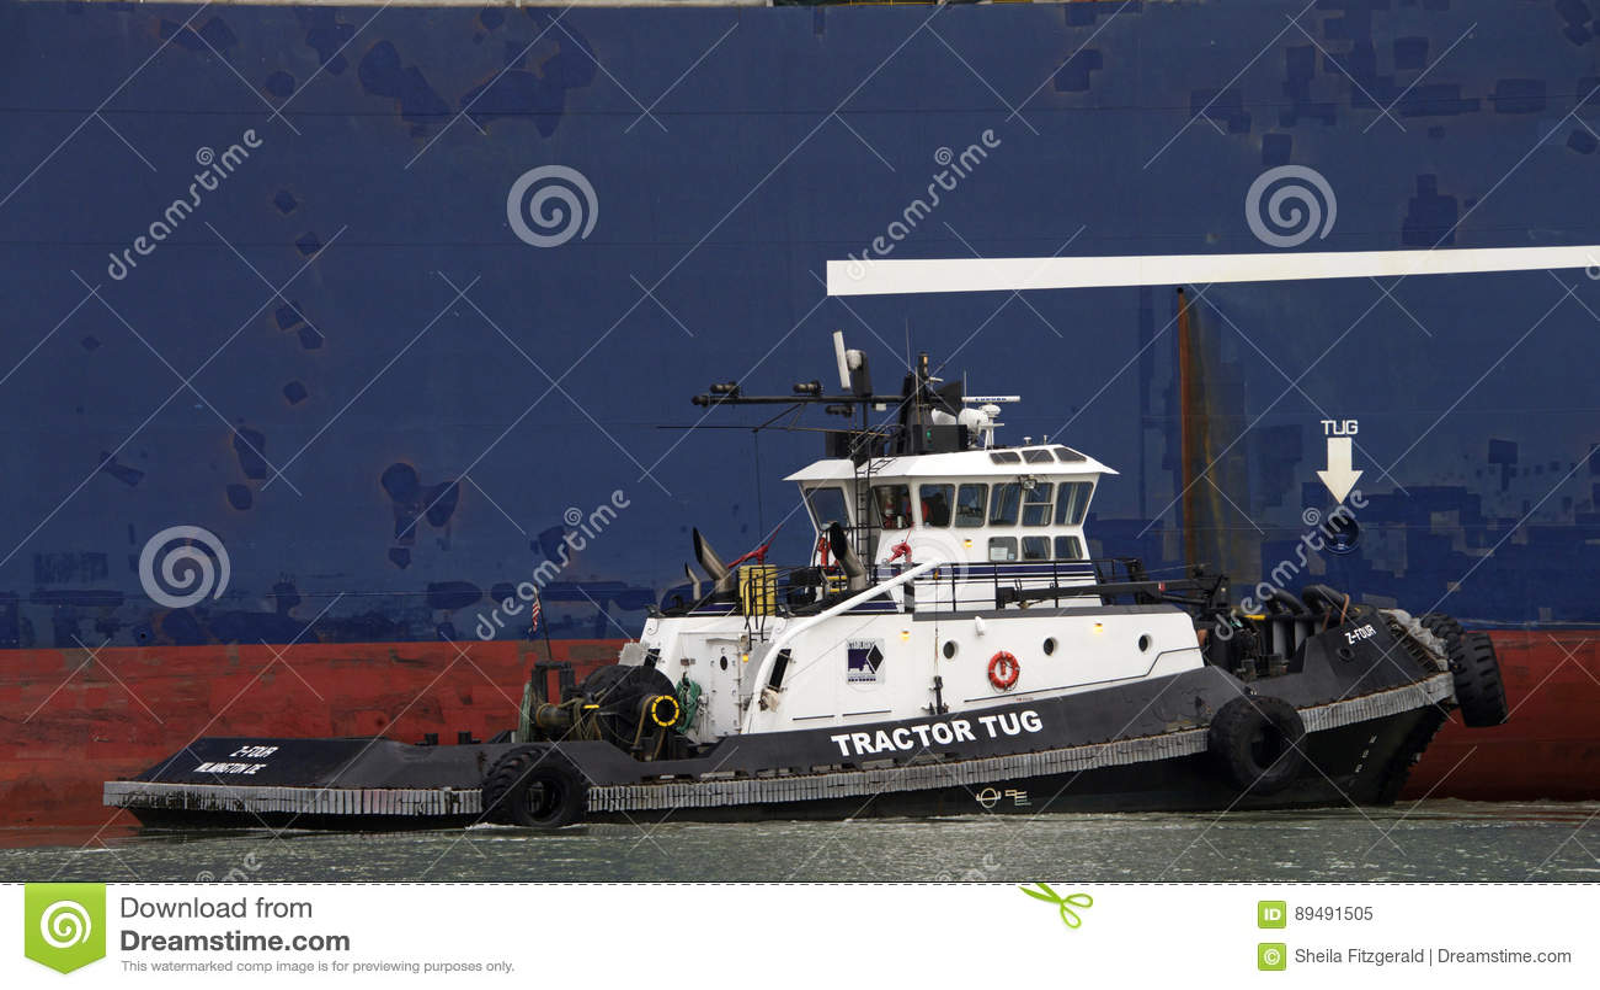 Tugboat ζ-ΤΕΣΣΕΡΑ βοηθώντας ελιγμός του CGM LYRA φορτηγών πλοίων CMA